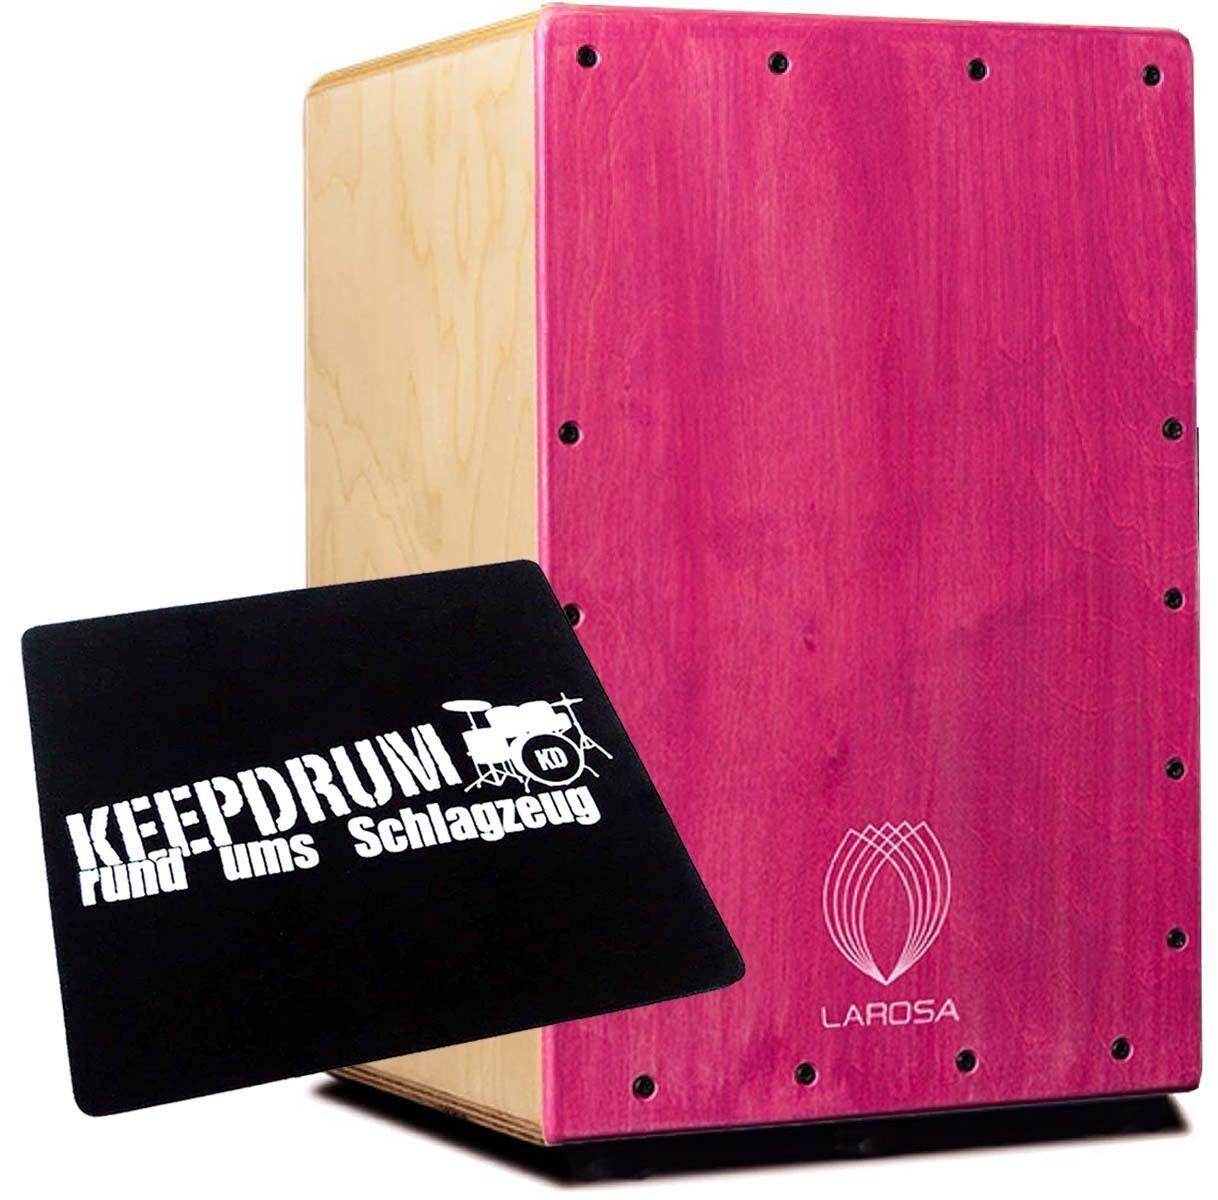 La rosa Basic Cajon junior Pink Cajon Basic + KEEPDRUM sitzpad aadb23